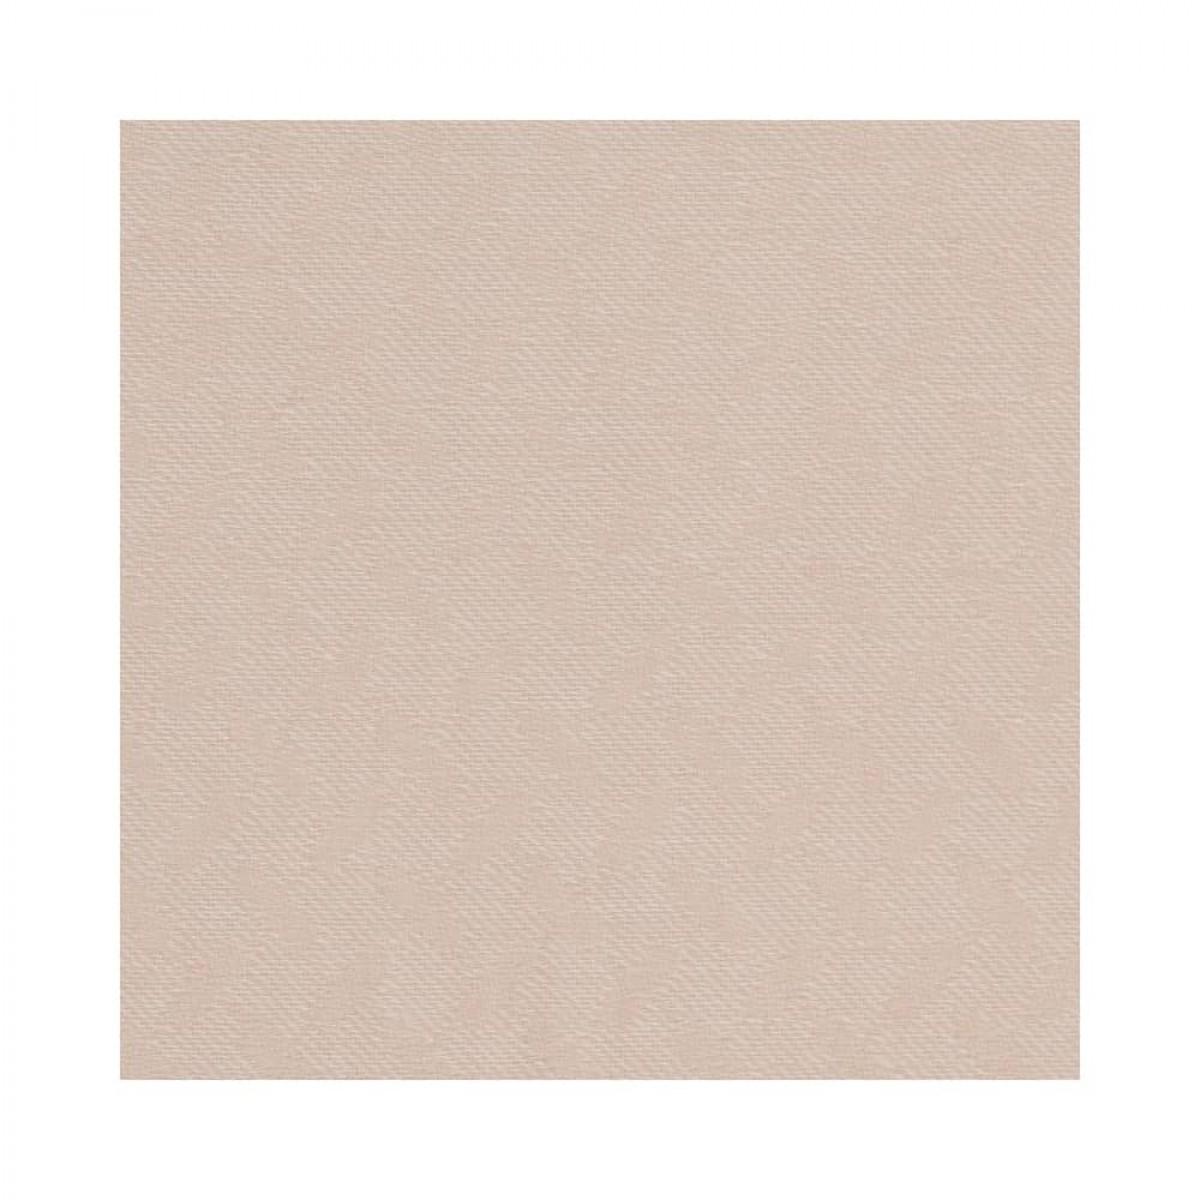 cotton cube gradient jacquard - trinity sand - print detalje